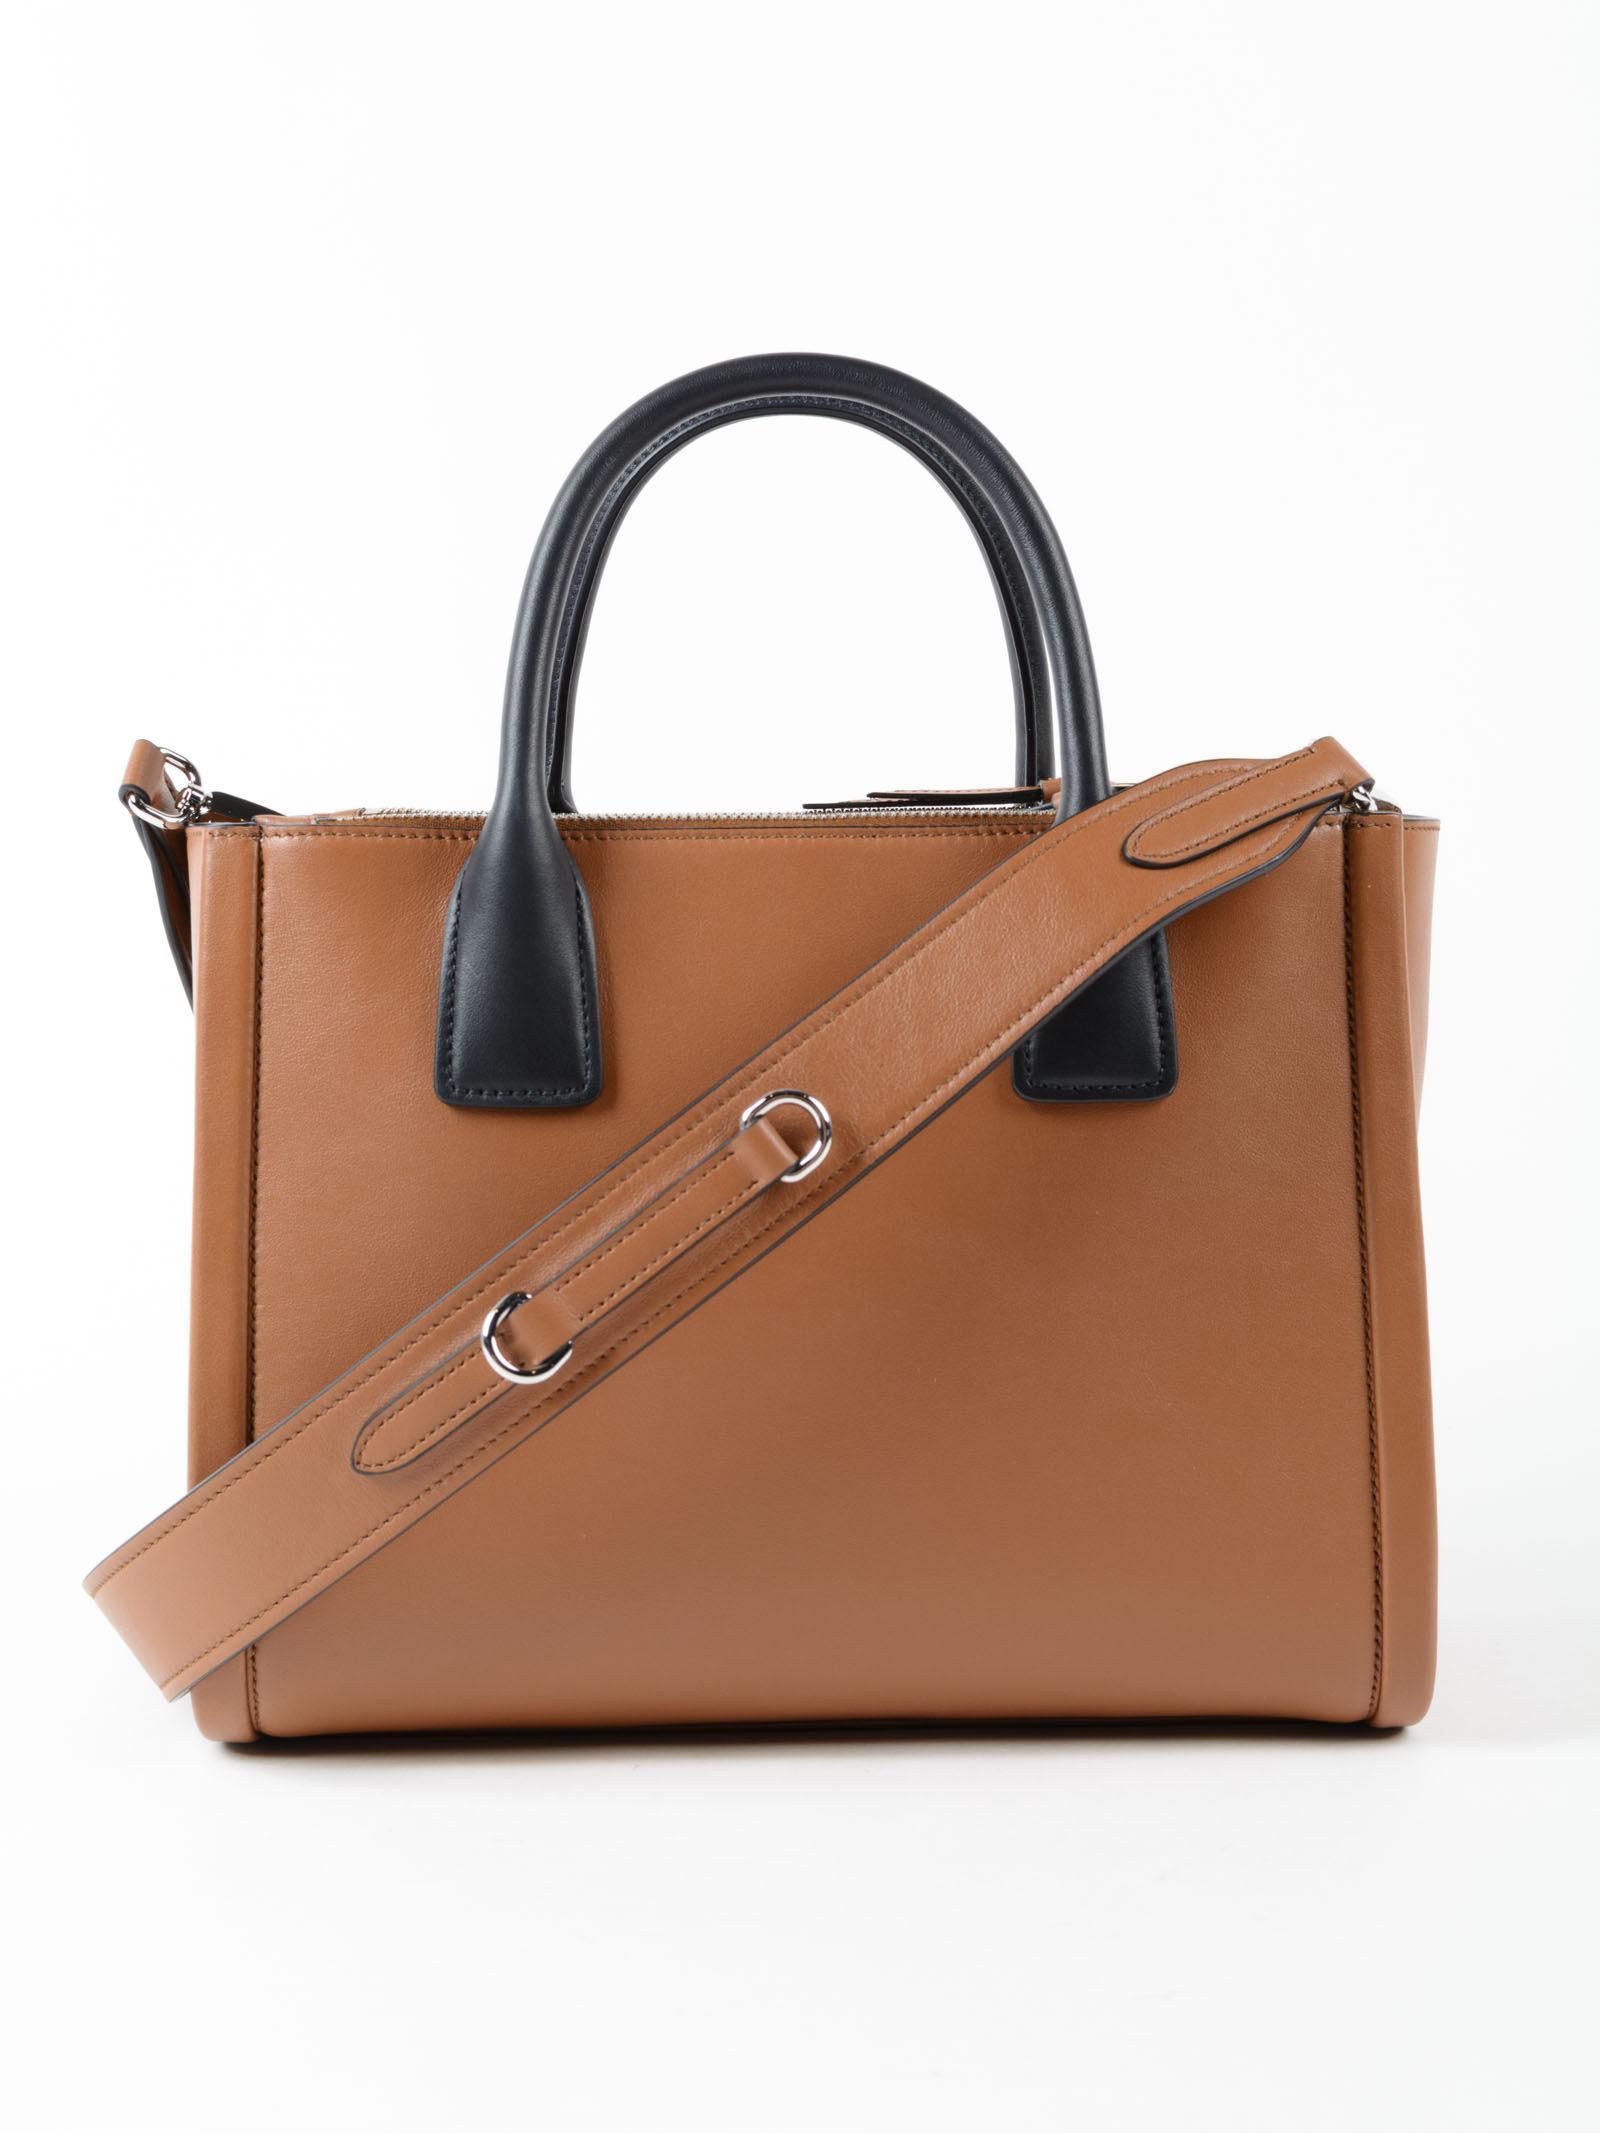 c7de26af1bdb Prada Grace Lux Handbag in Brown - Lyst